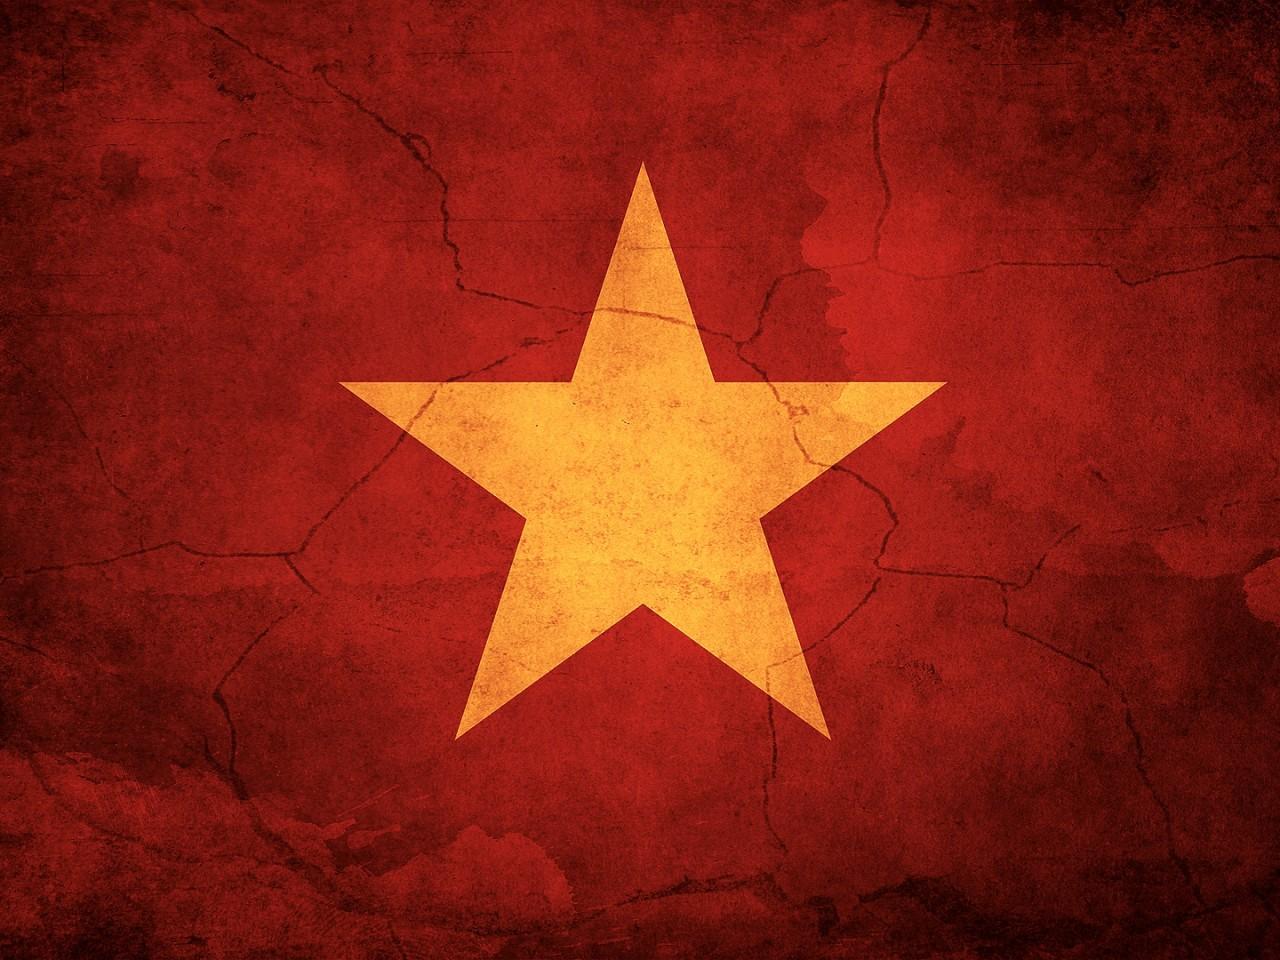 Wallpaper Iphone Hd Keren Vietnam Flag Wallpaper Hd Wallpapers